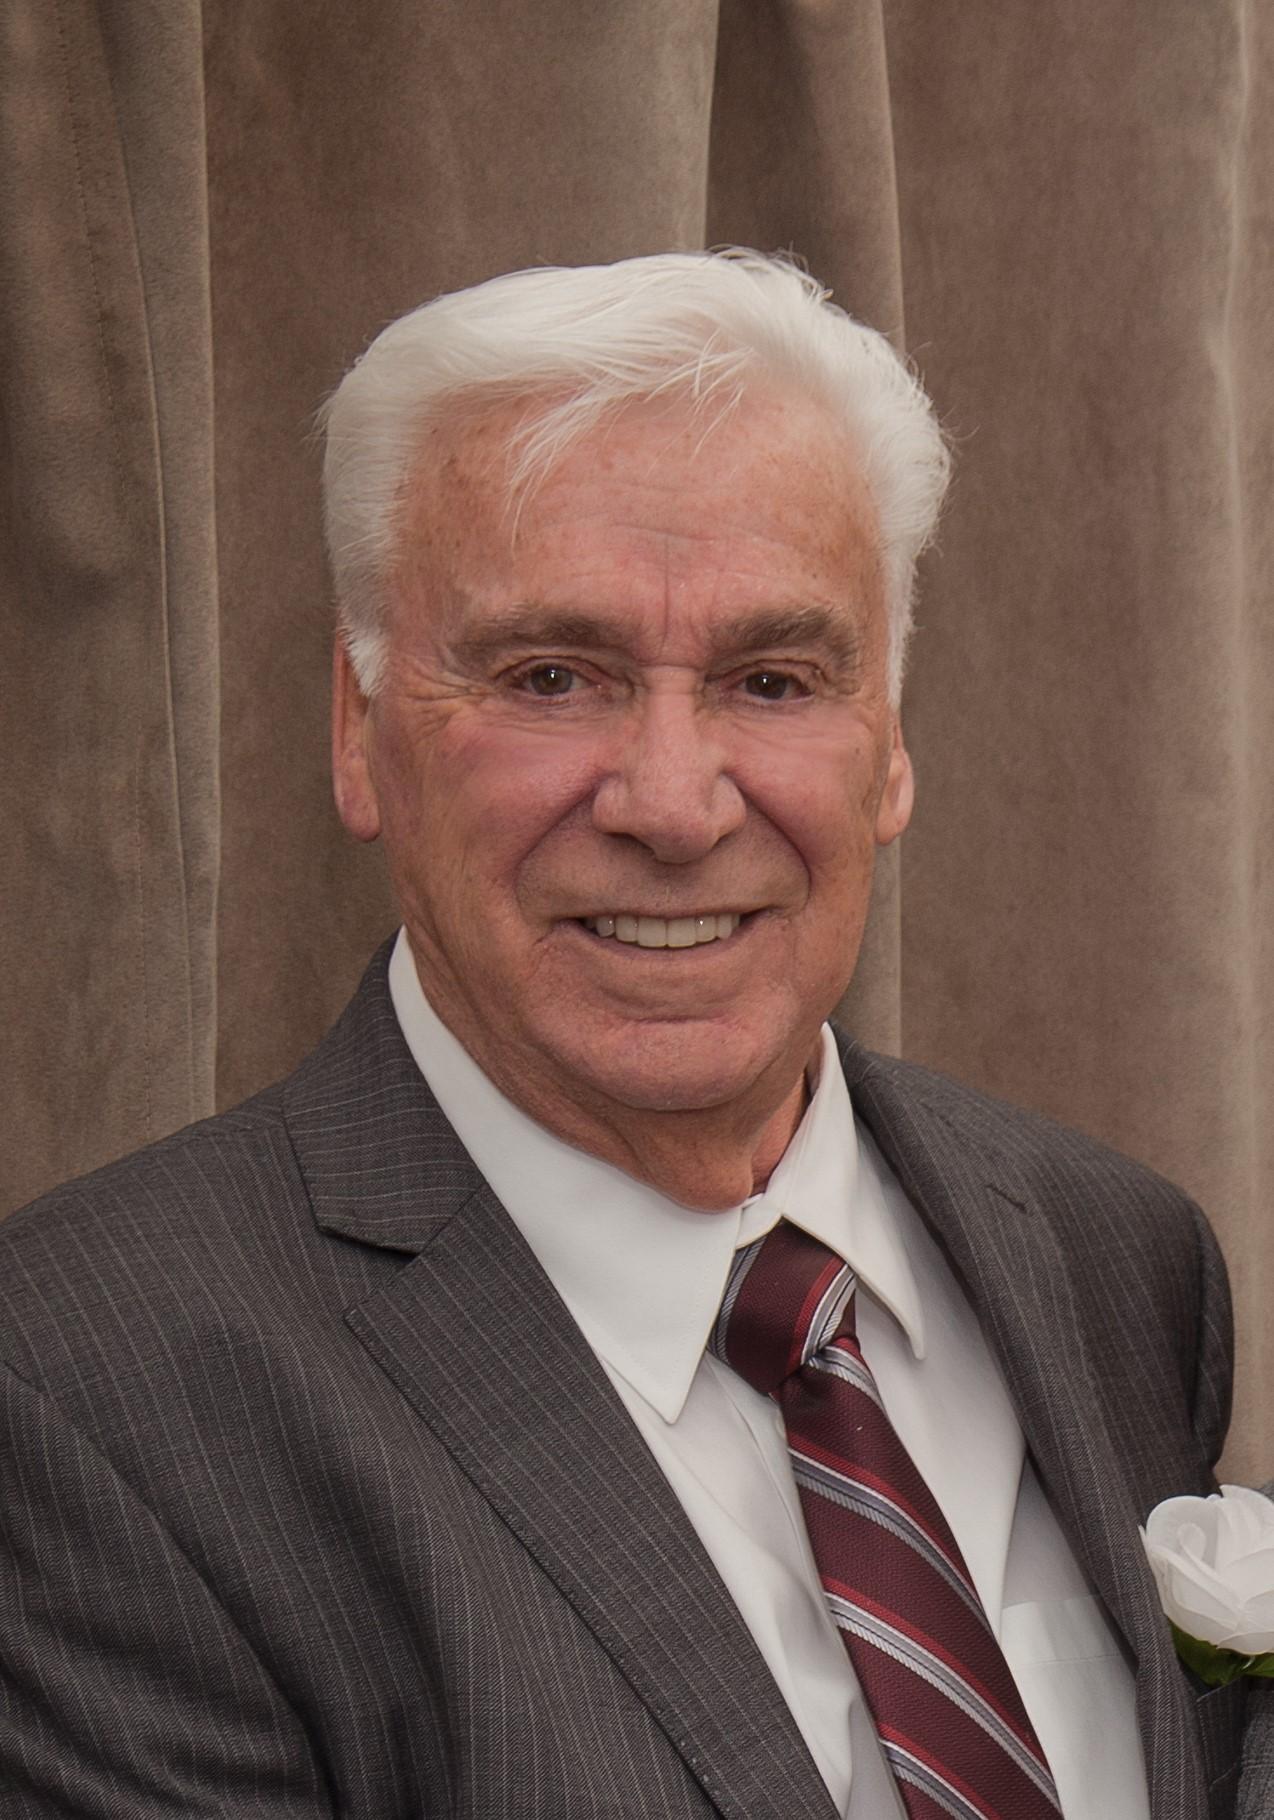 Michel Tétreault - 1942-2017